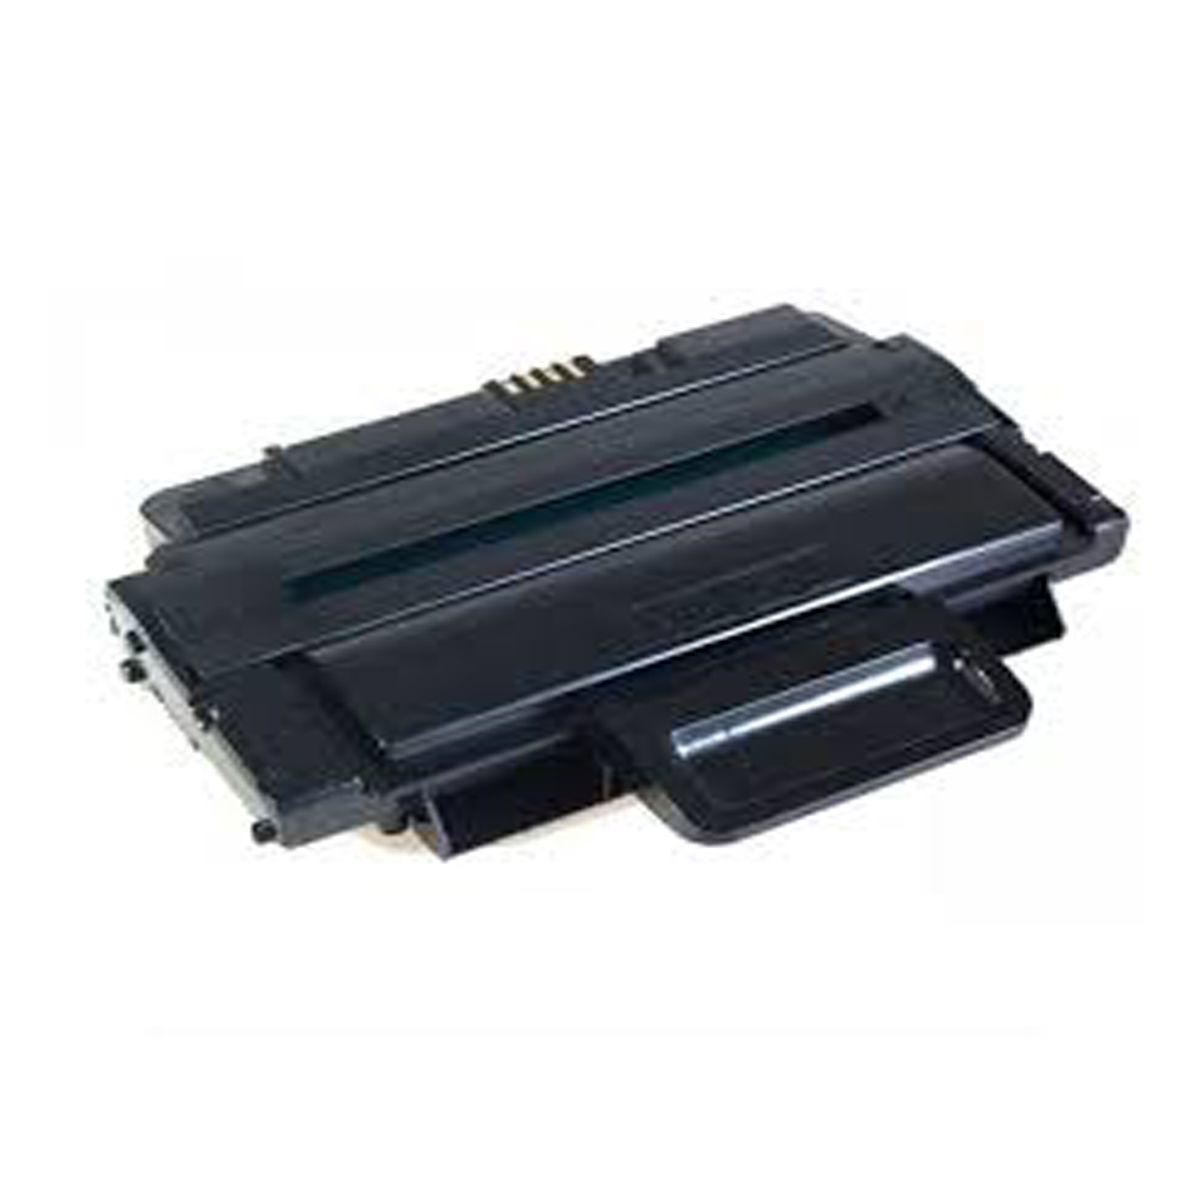 Toner Samsung SCX2850 ML2850 ML2851 2850 2851 - Compatível